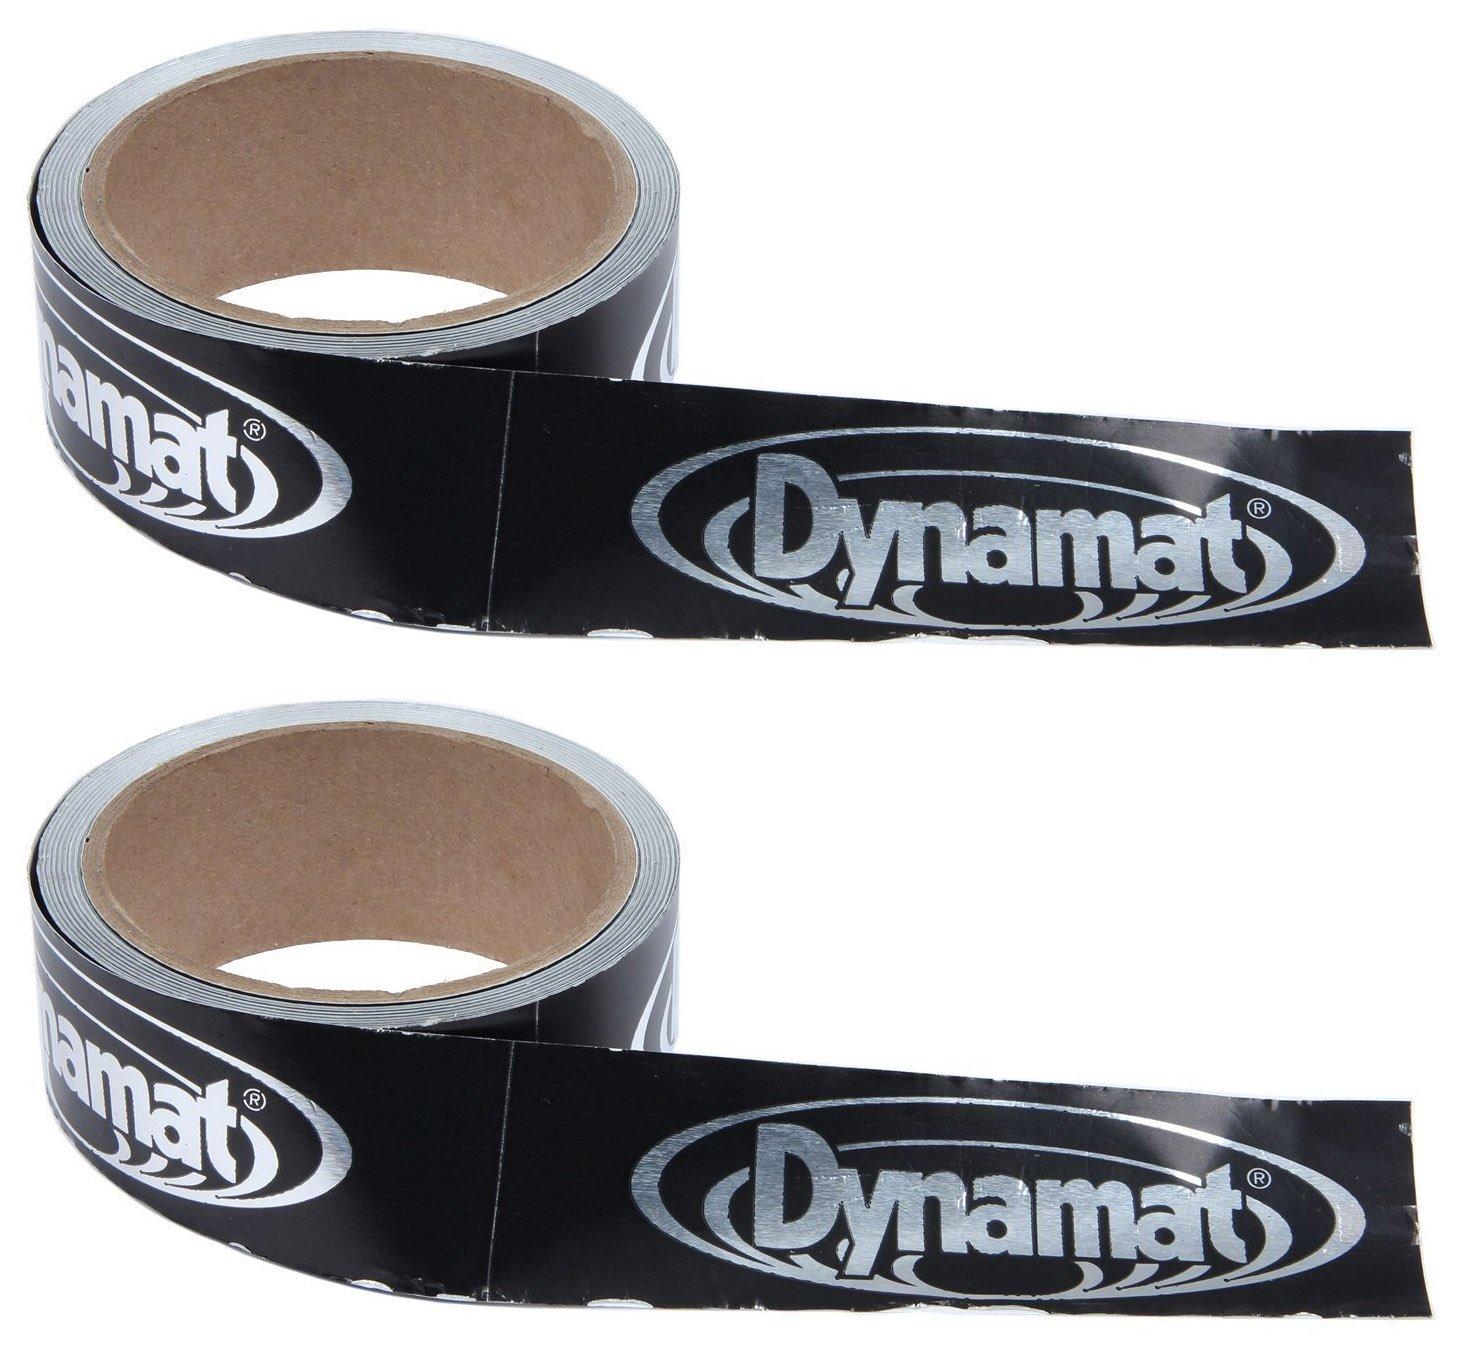 Dynamat 13100 1-1/2'' Wide and 30' Long DynaTape Sound Deadener (2-Pack)